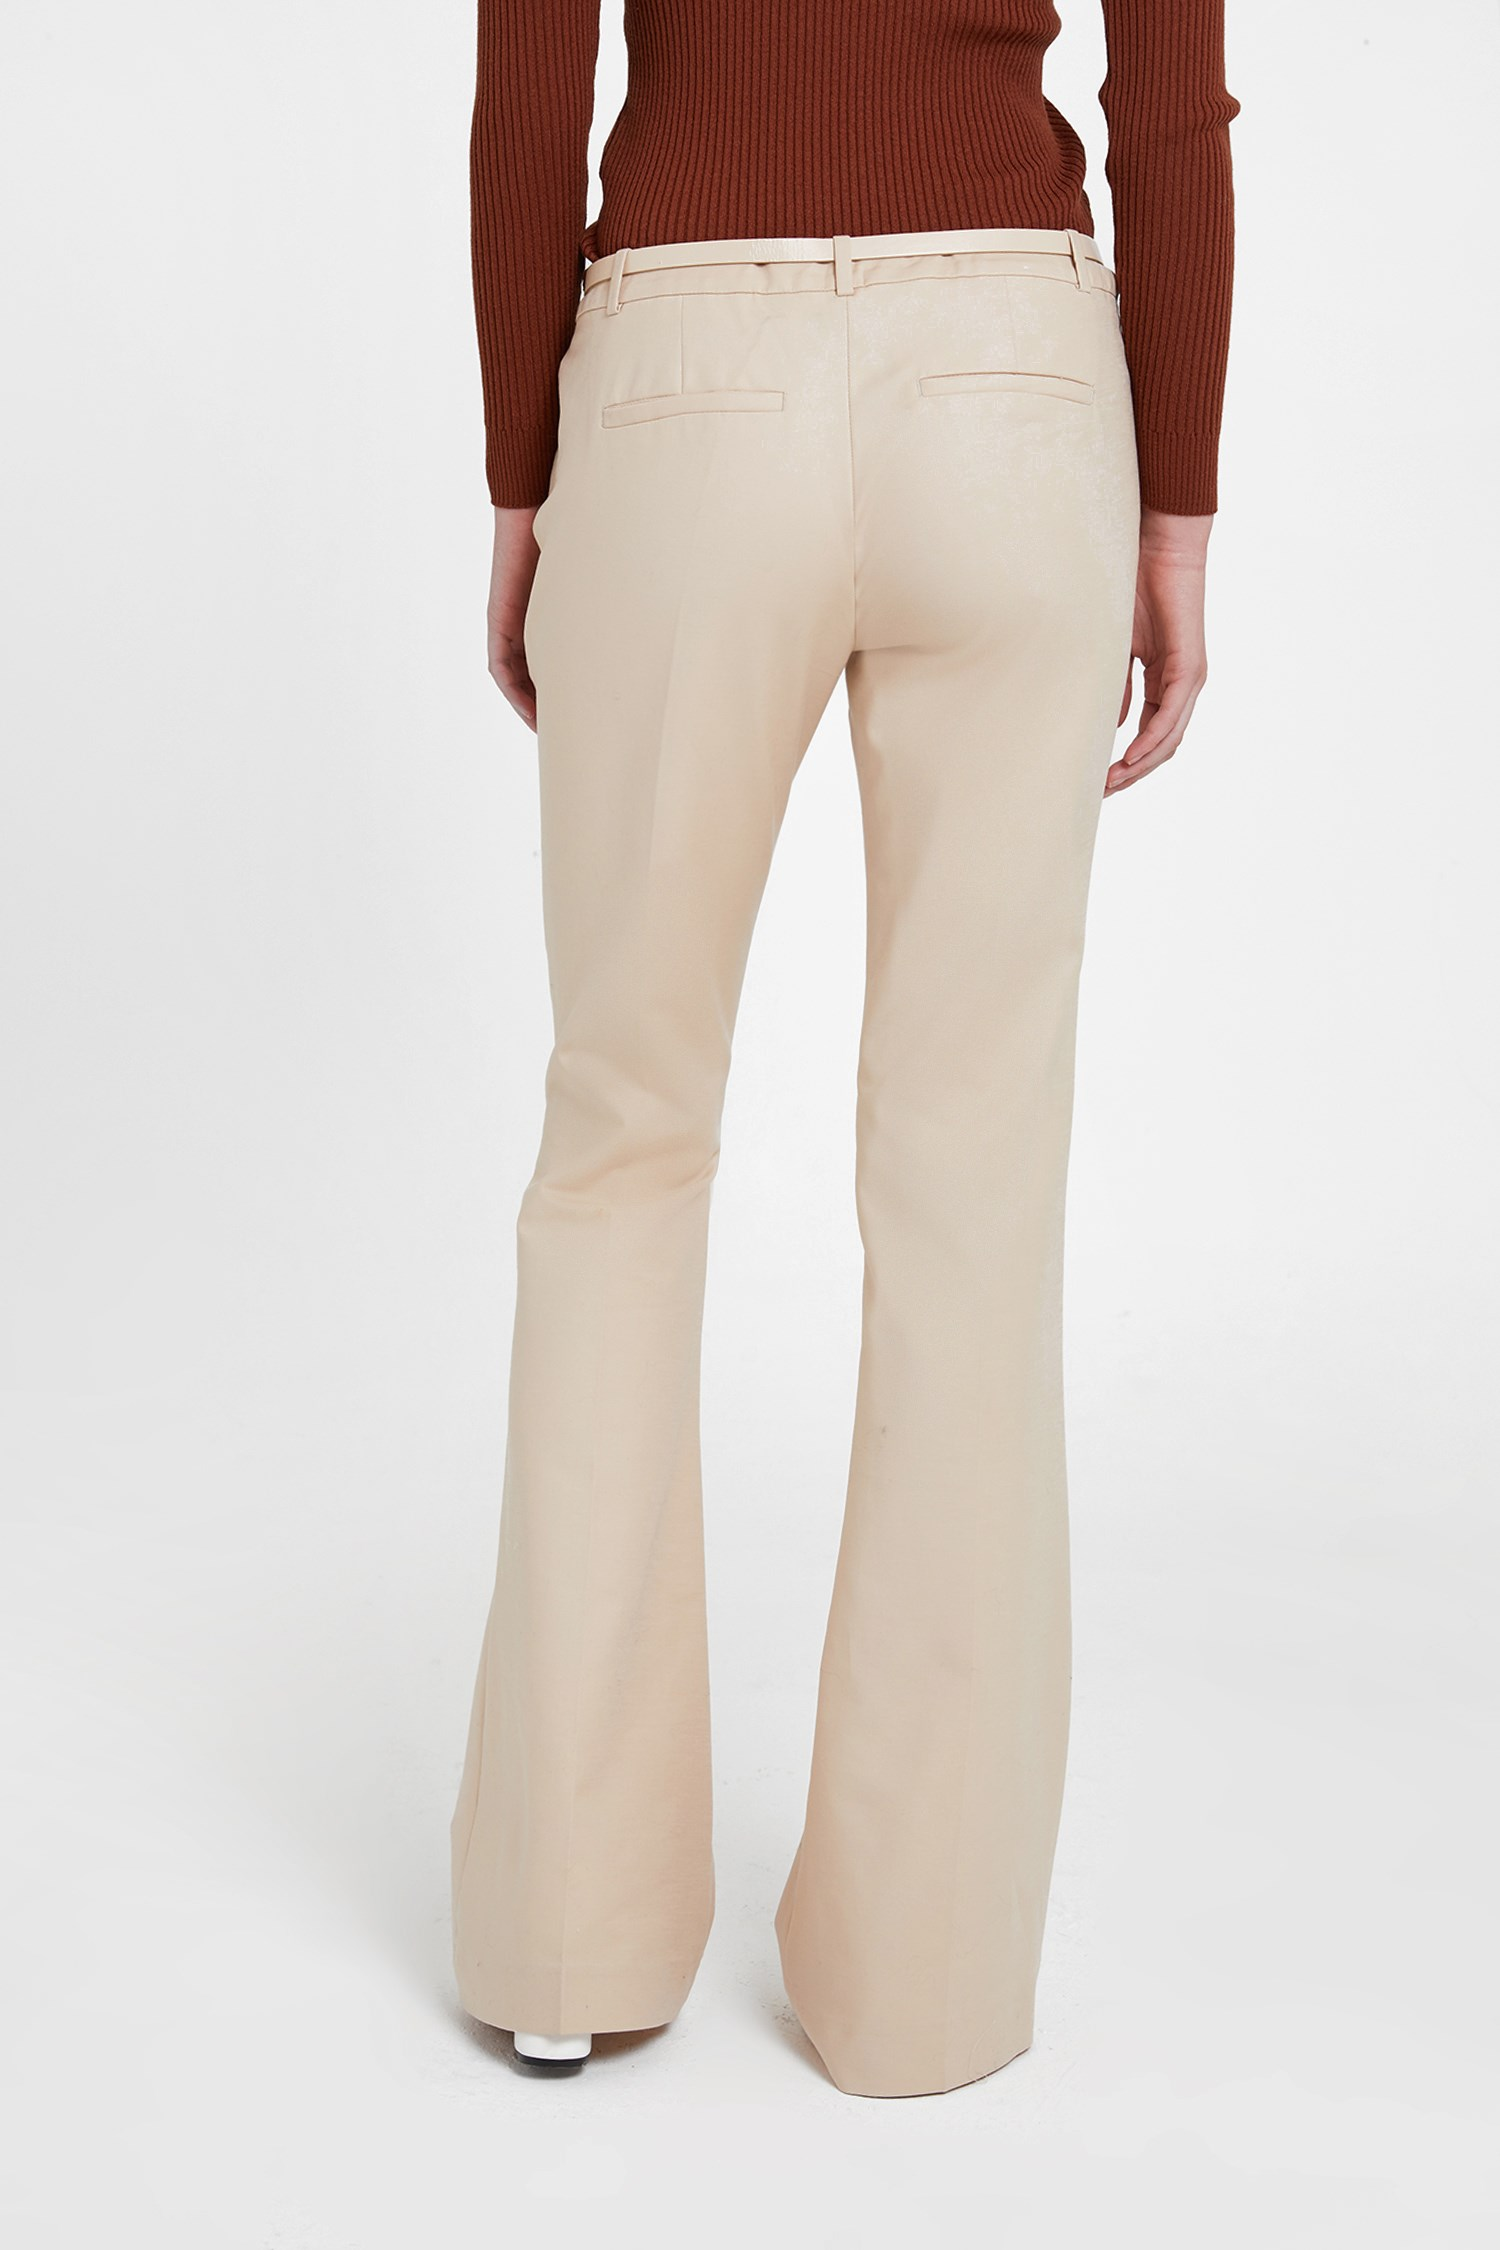 Bayan Krem Geniş Paça Pantolon